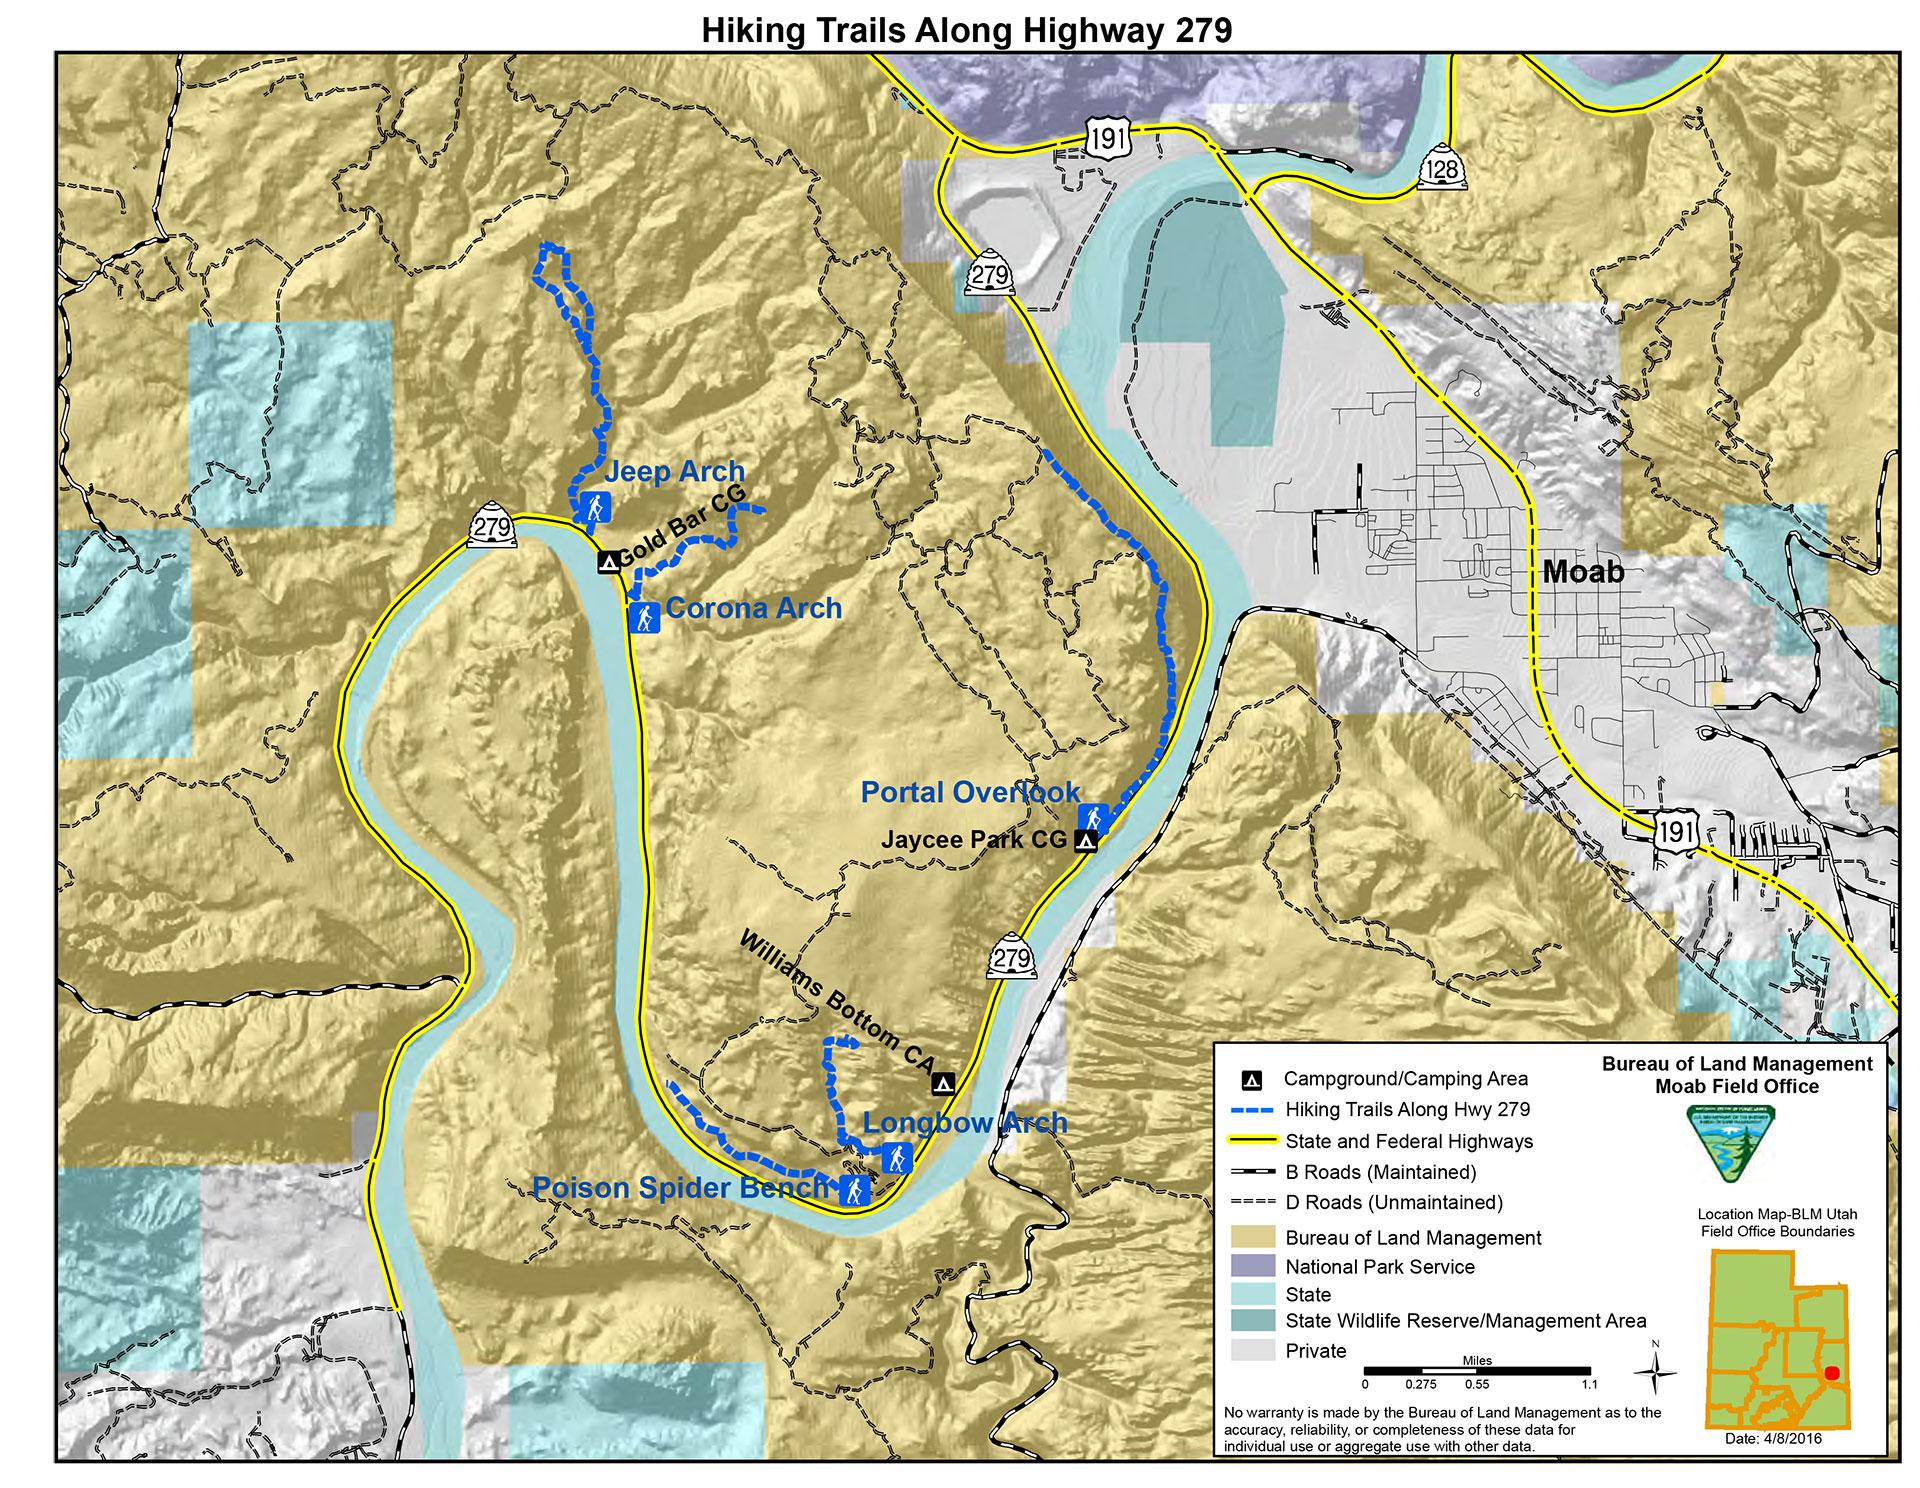 Hiking - Discover Moab, Utah on canyons park city ski map, park city lift map, sedona arizona hiking trails map, canyons resort village map, canyons ski trail map, the canyons ski resort, the canyons park city, grand canyon hiking map, into the wild trail map, utah canyons map,